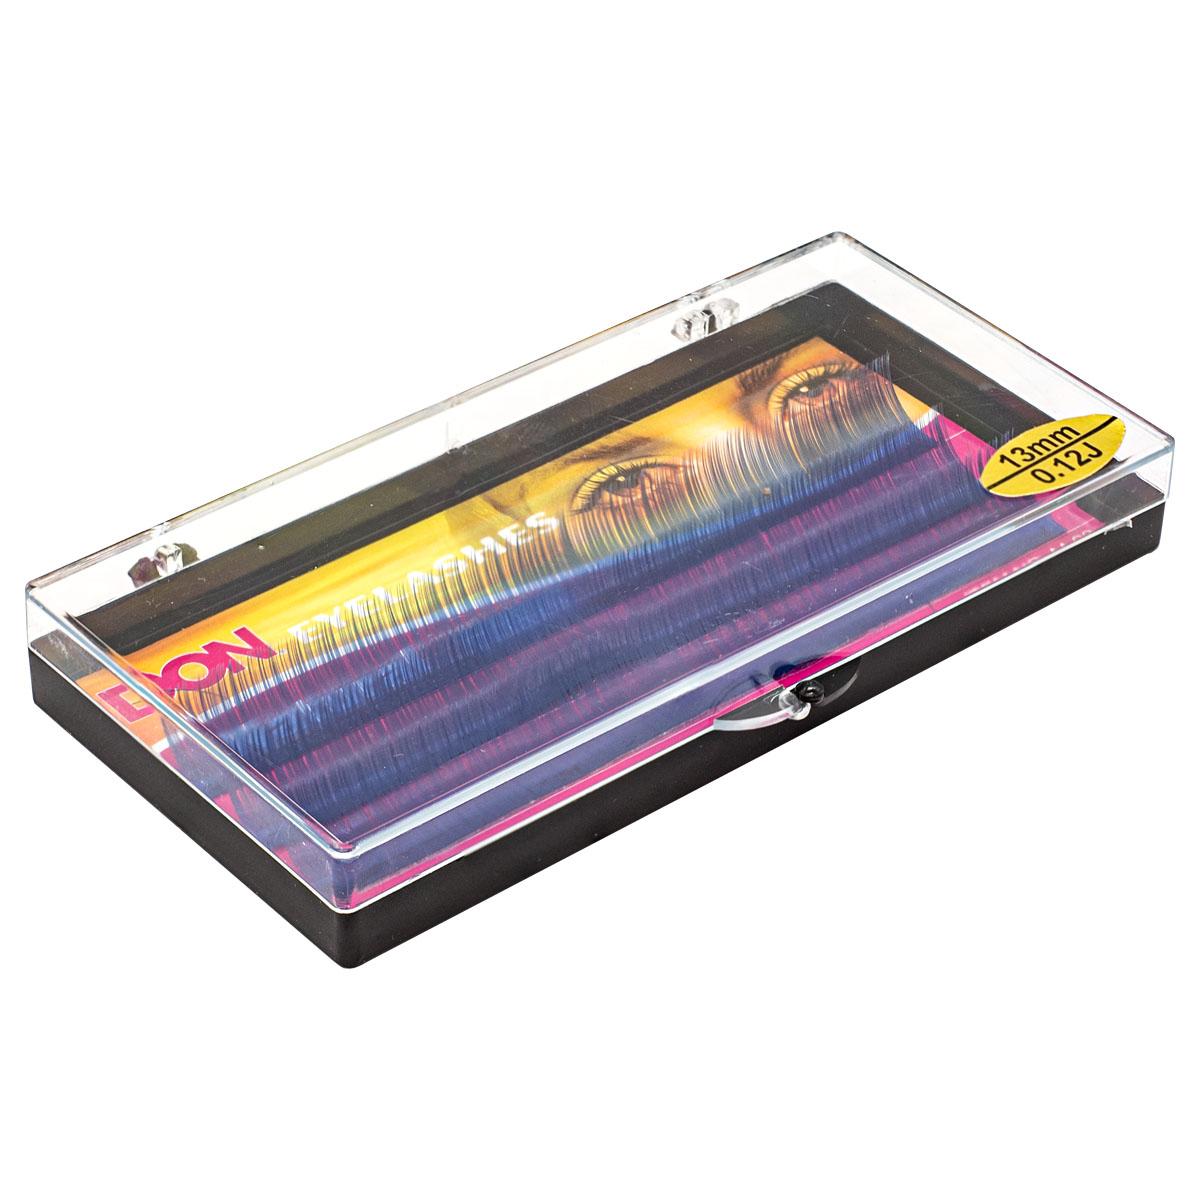 28876 Ресницы 'DON' № М-003, 13мм L=9,5см в коробочке